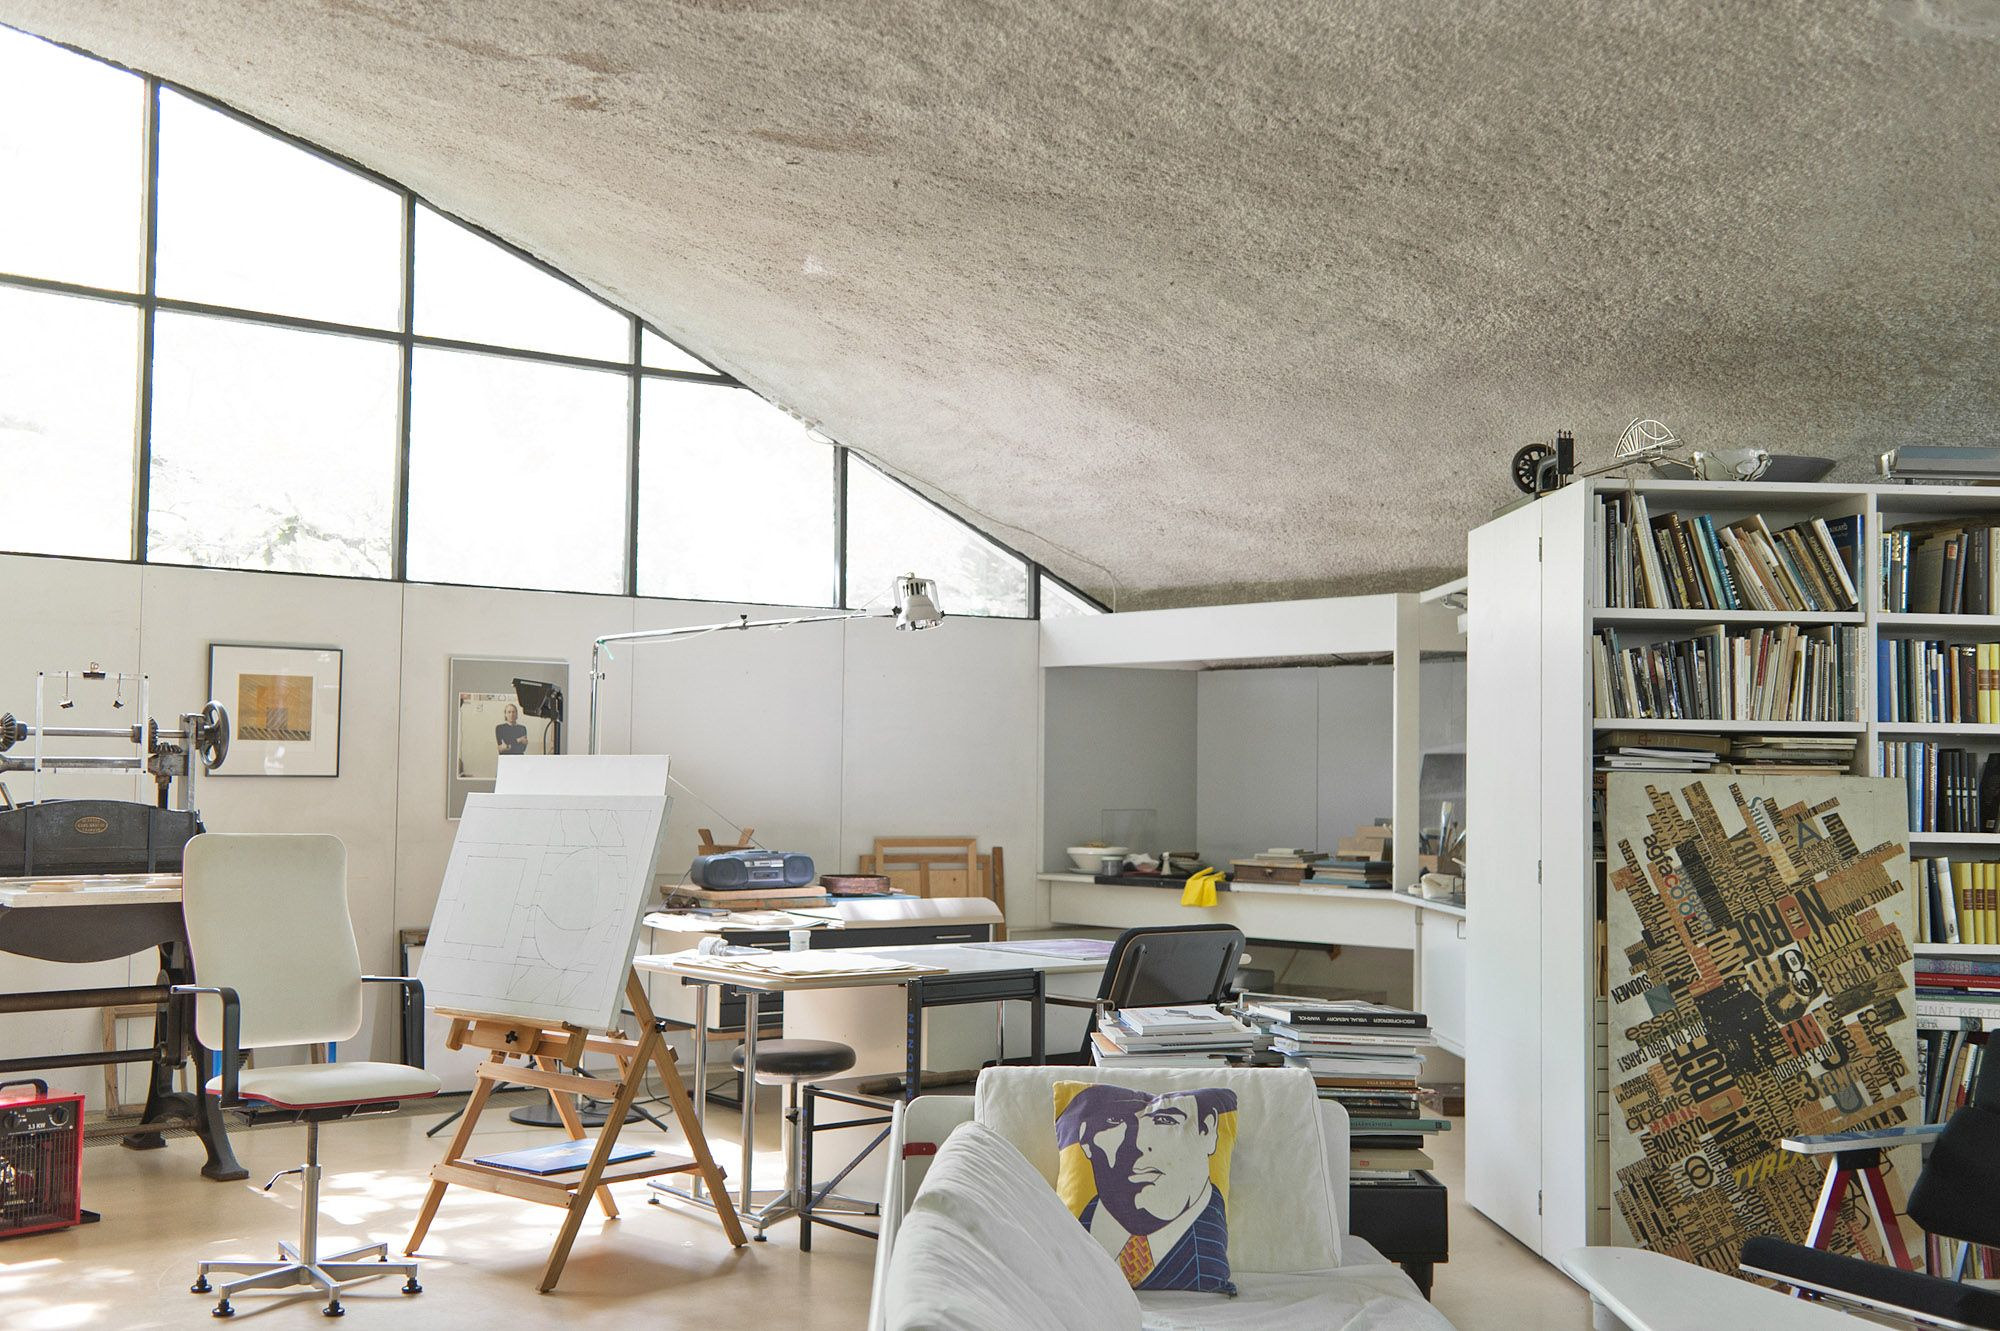 Interior architect Yrjö Kukkapuro's home studio.